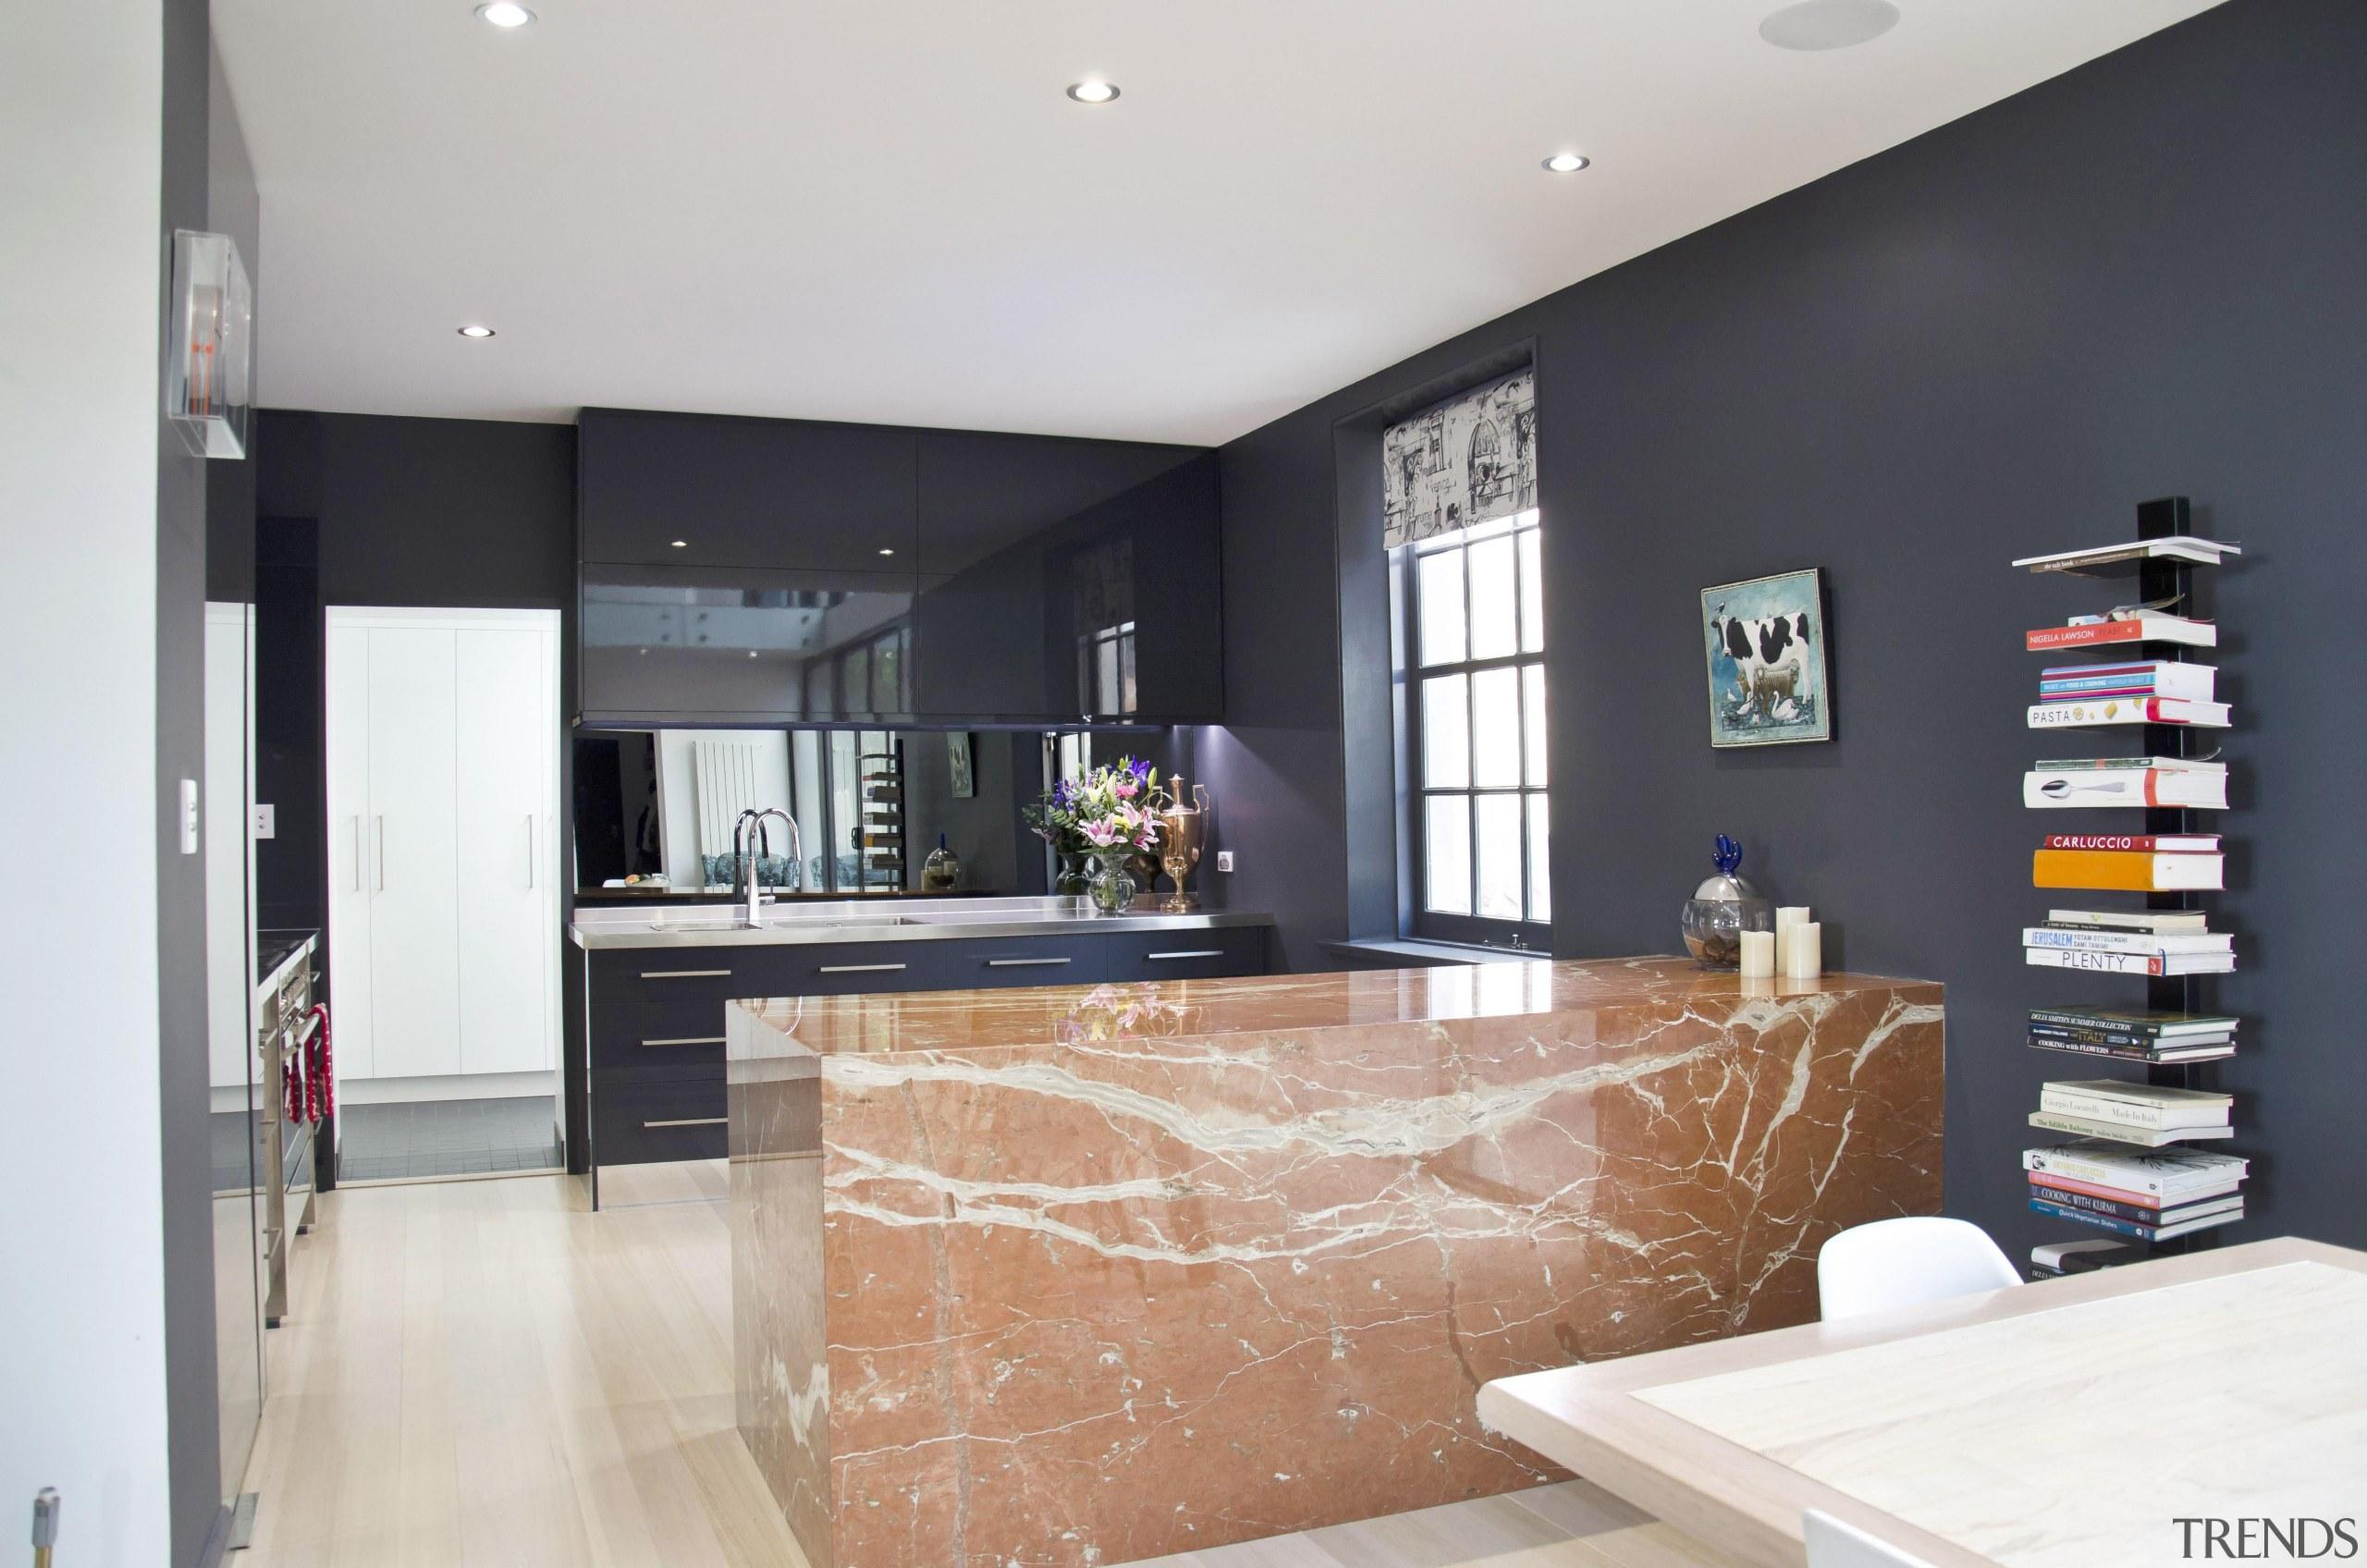 Winner Kitchen of the Year 2013 Tasmania - countertop, interior design, kitchen, living room, property, real estate, room, gray